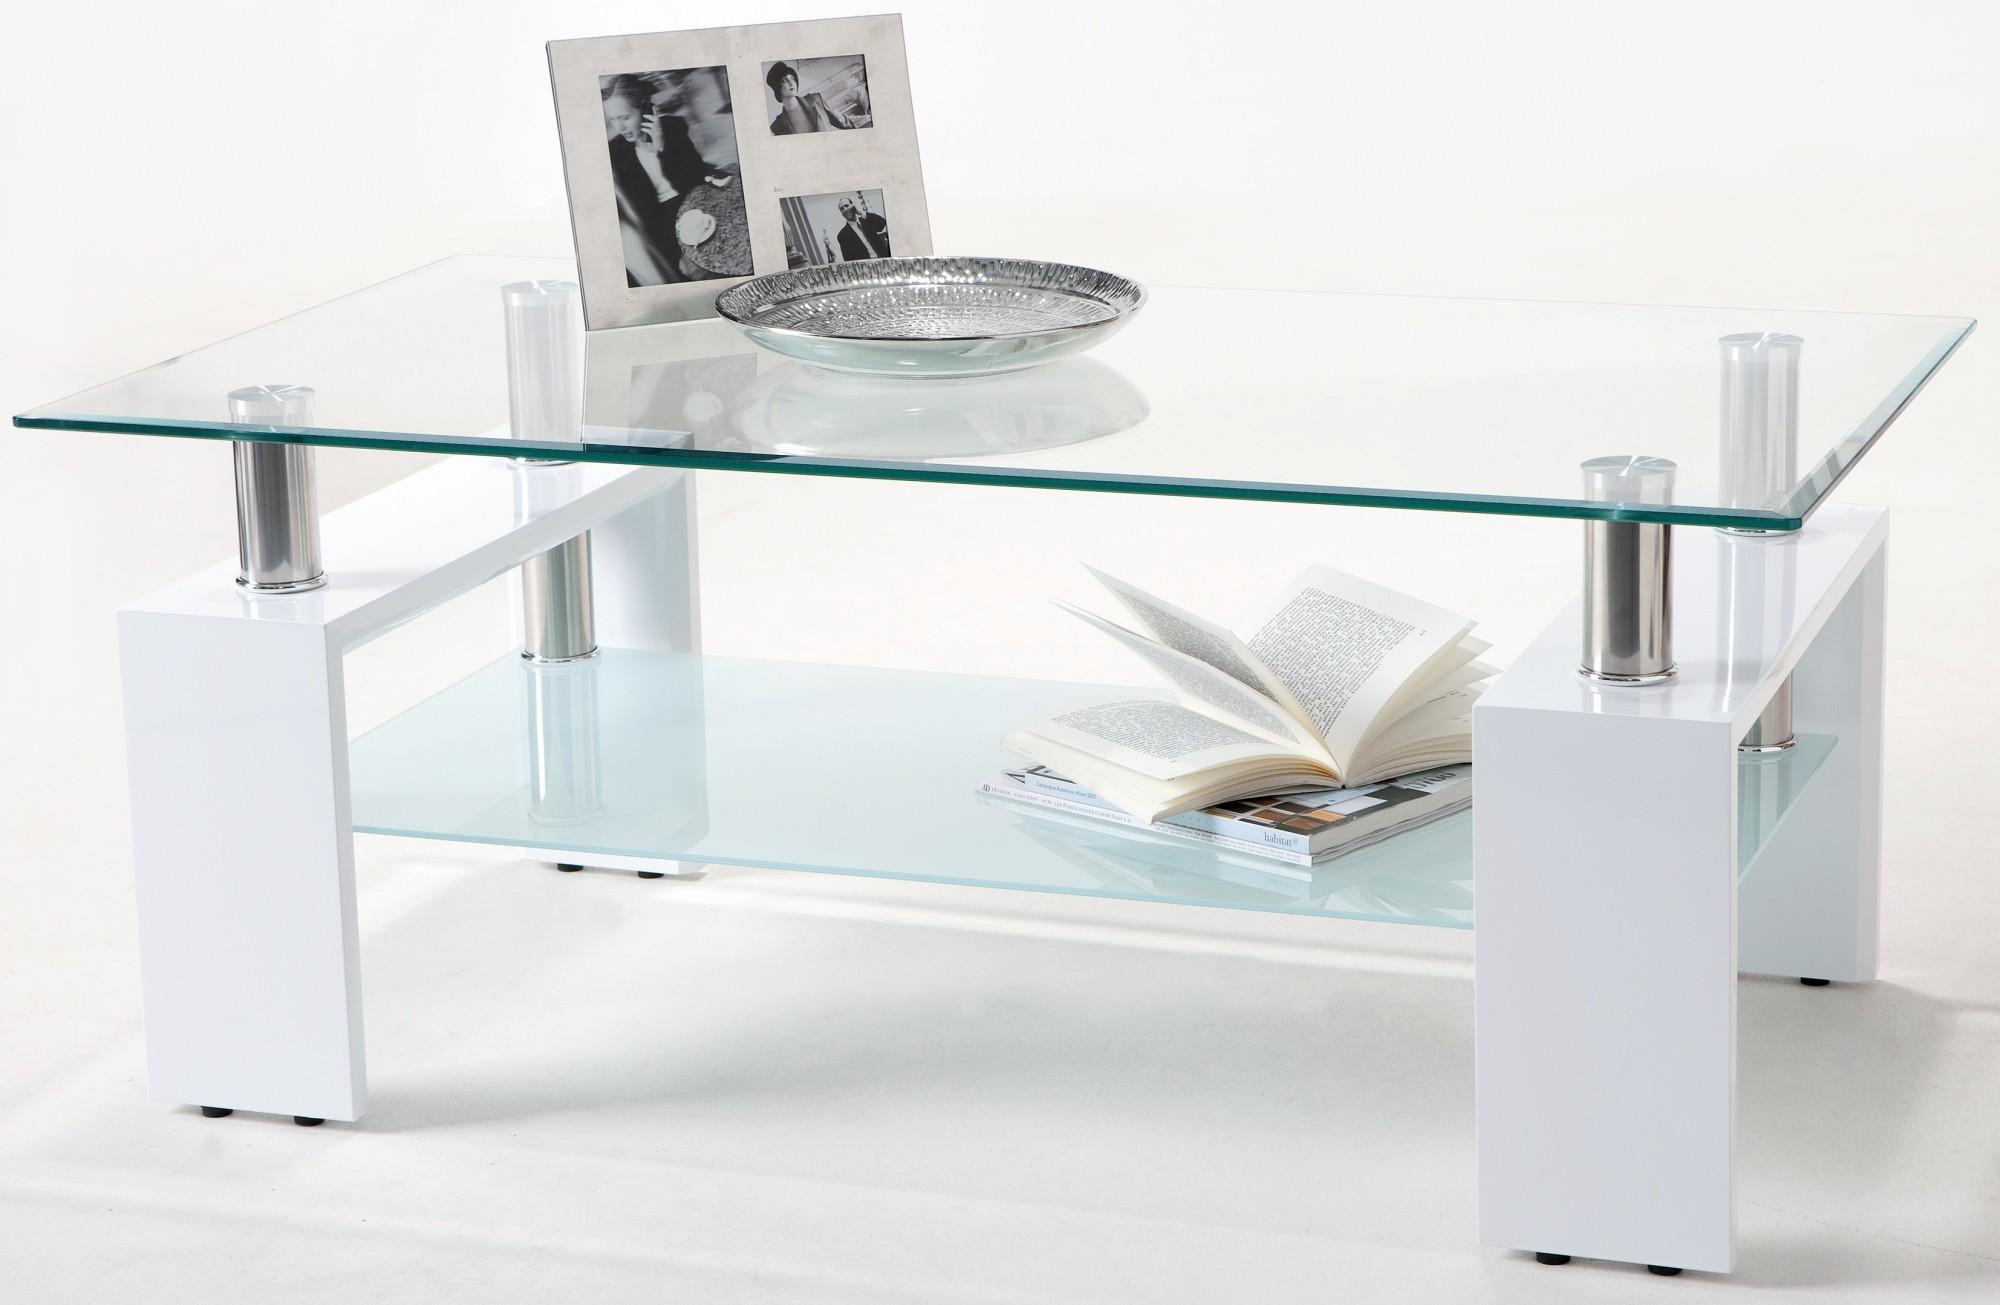 Table basse laqu e blanche et verre tremp kari - Table basse verre trempe ...